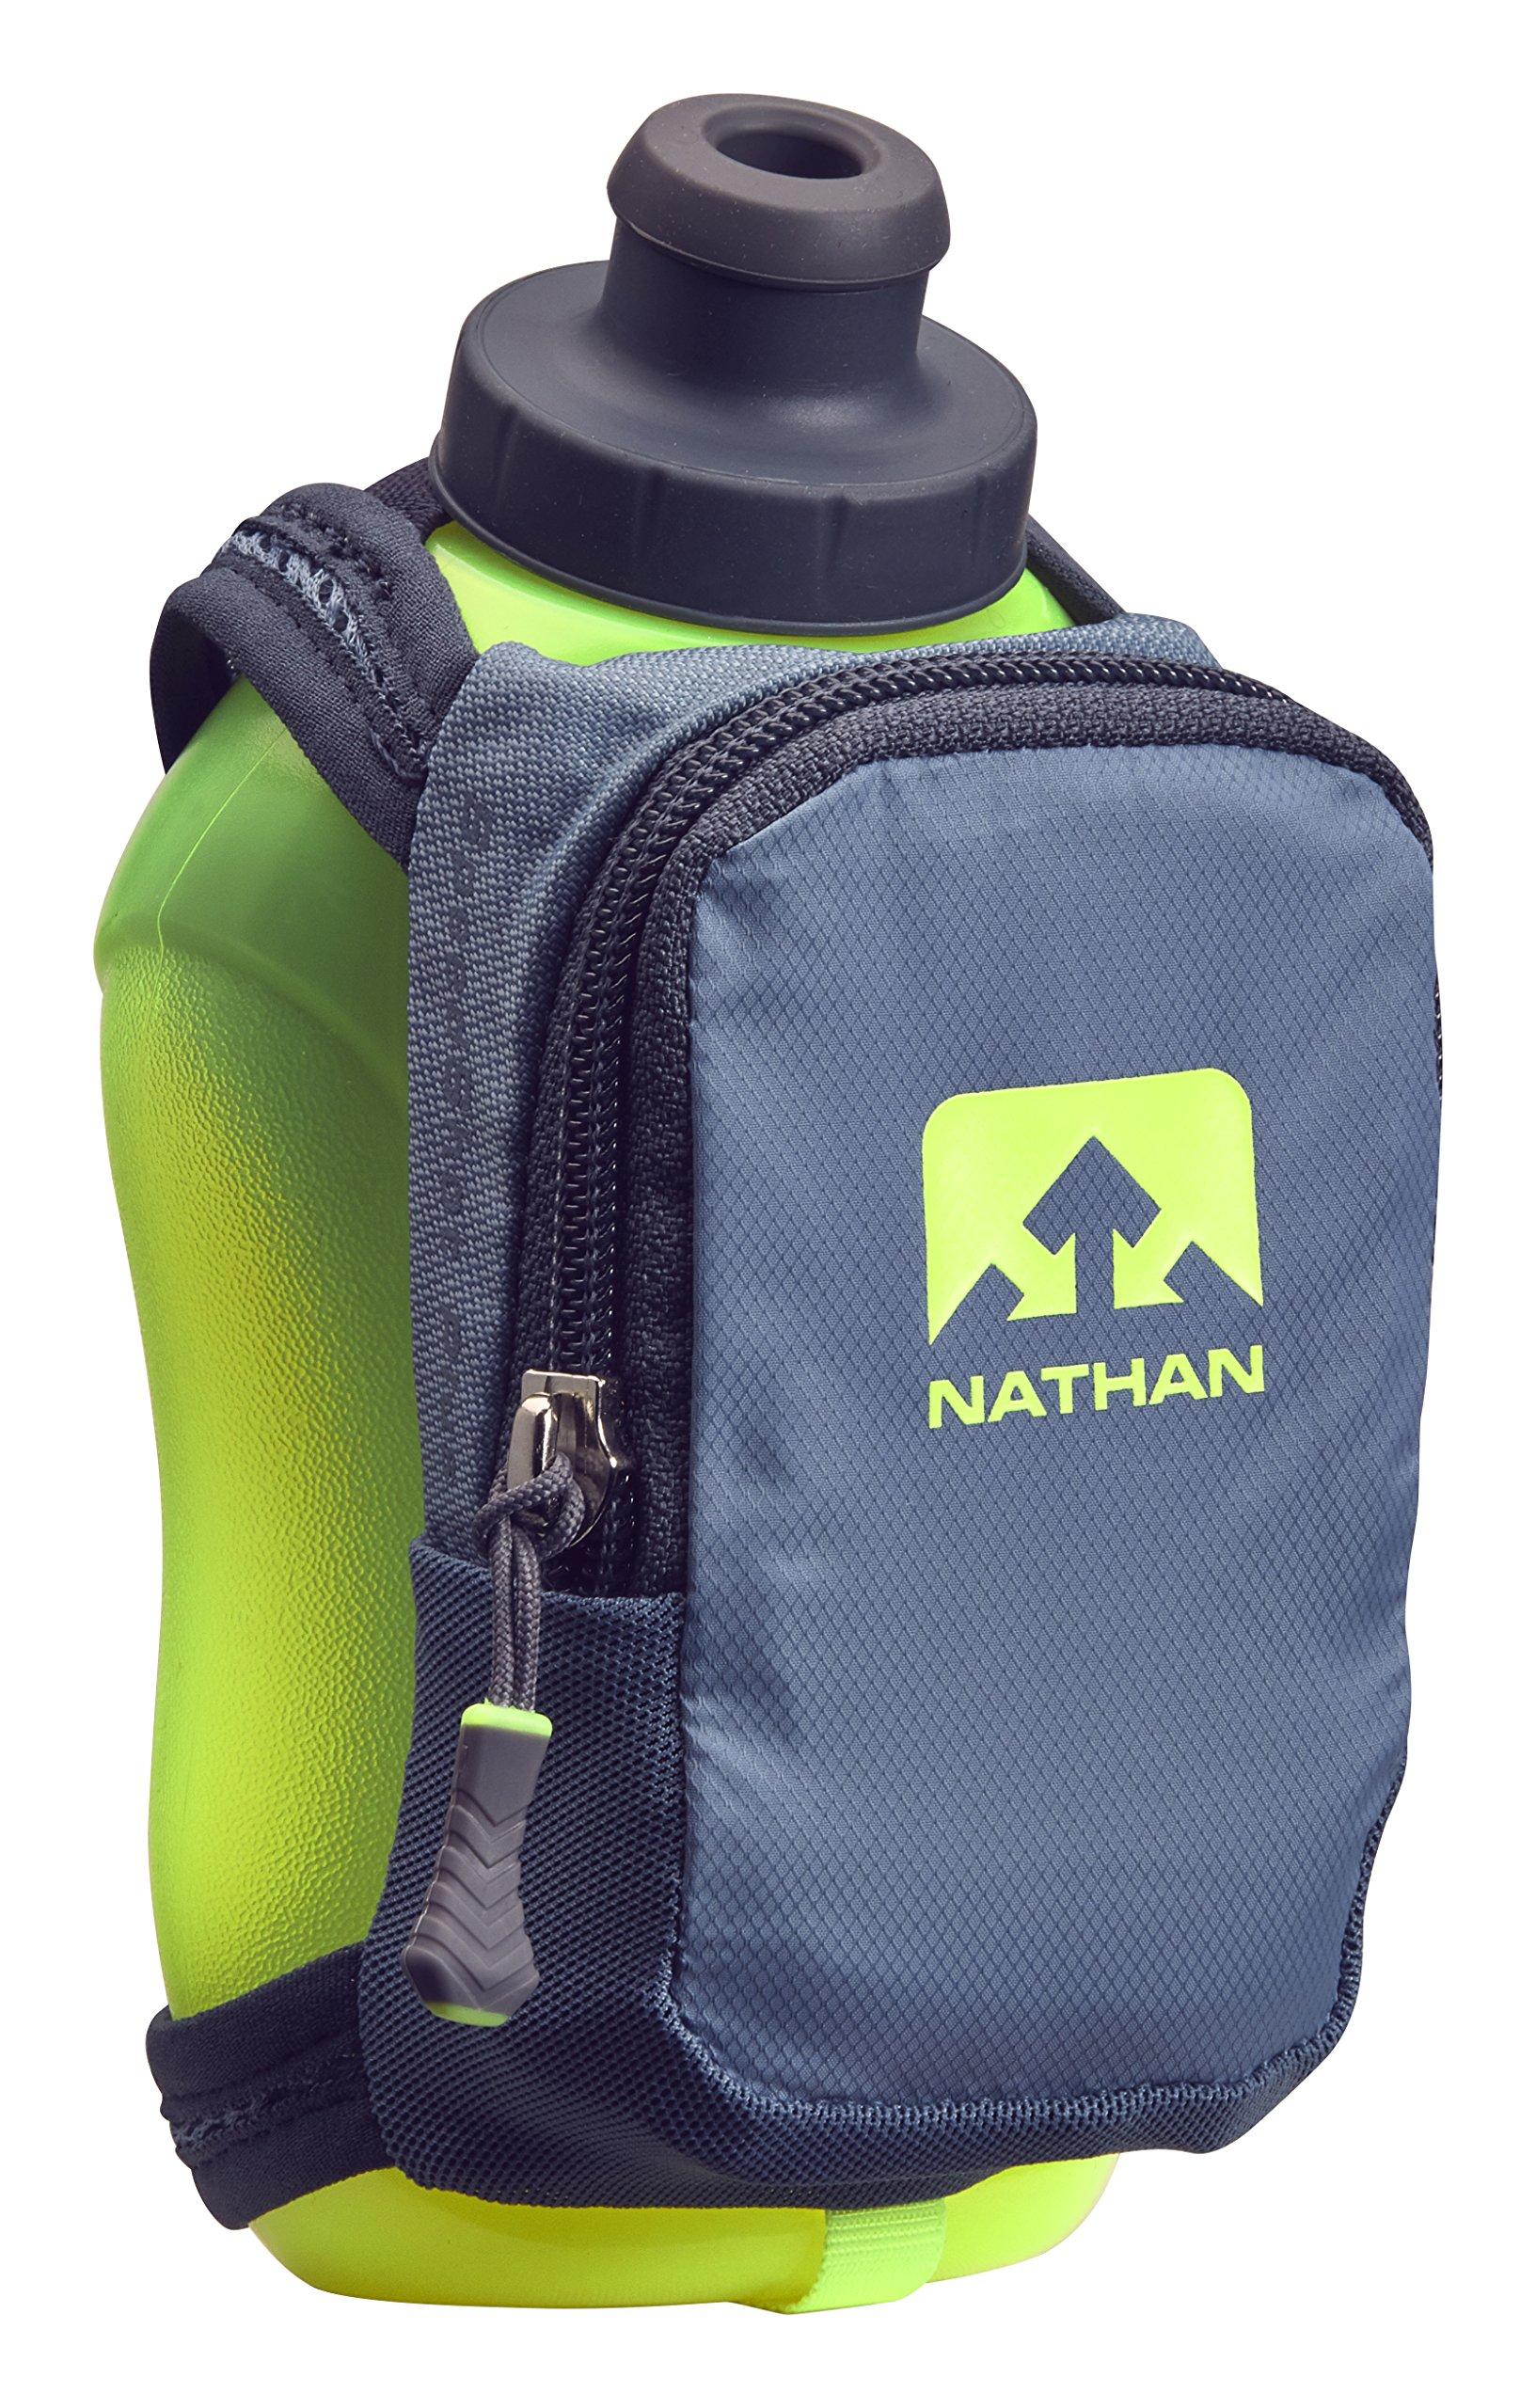 Nathan NS4859 Speedshot Plus Quick Grip 12 oz Running Water Bottle Flask with Zip Pocket, Blue Stone